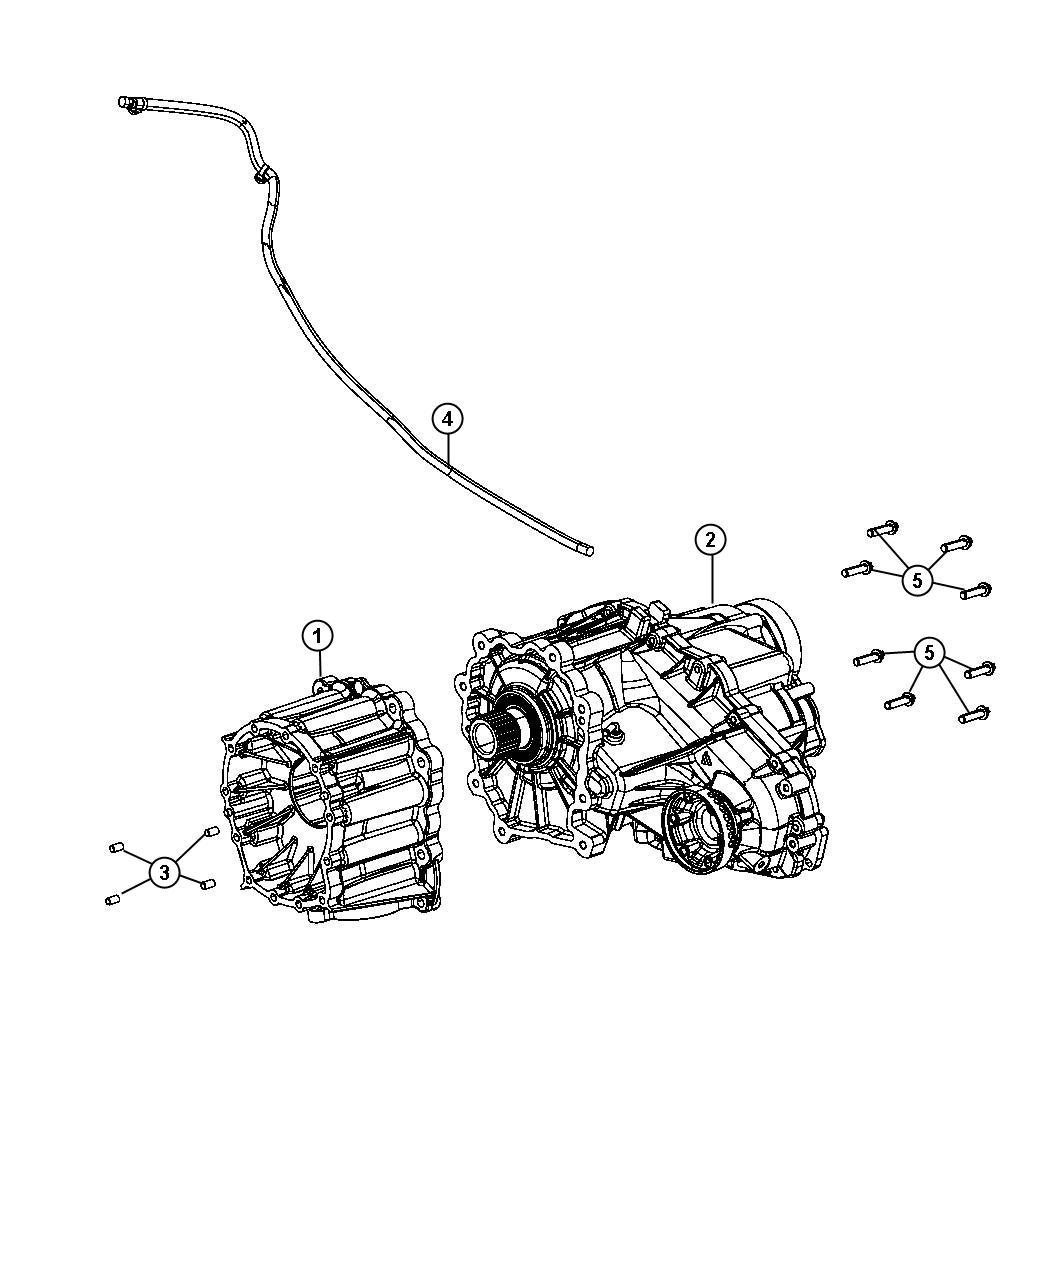 2013 Jeep Grand Cherokee Transfer case